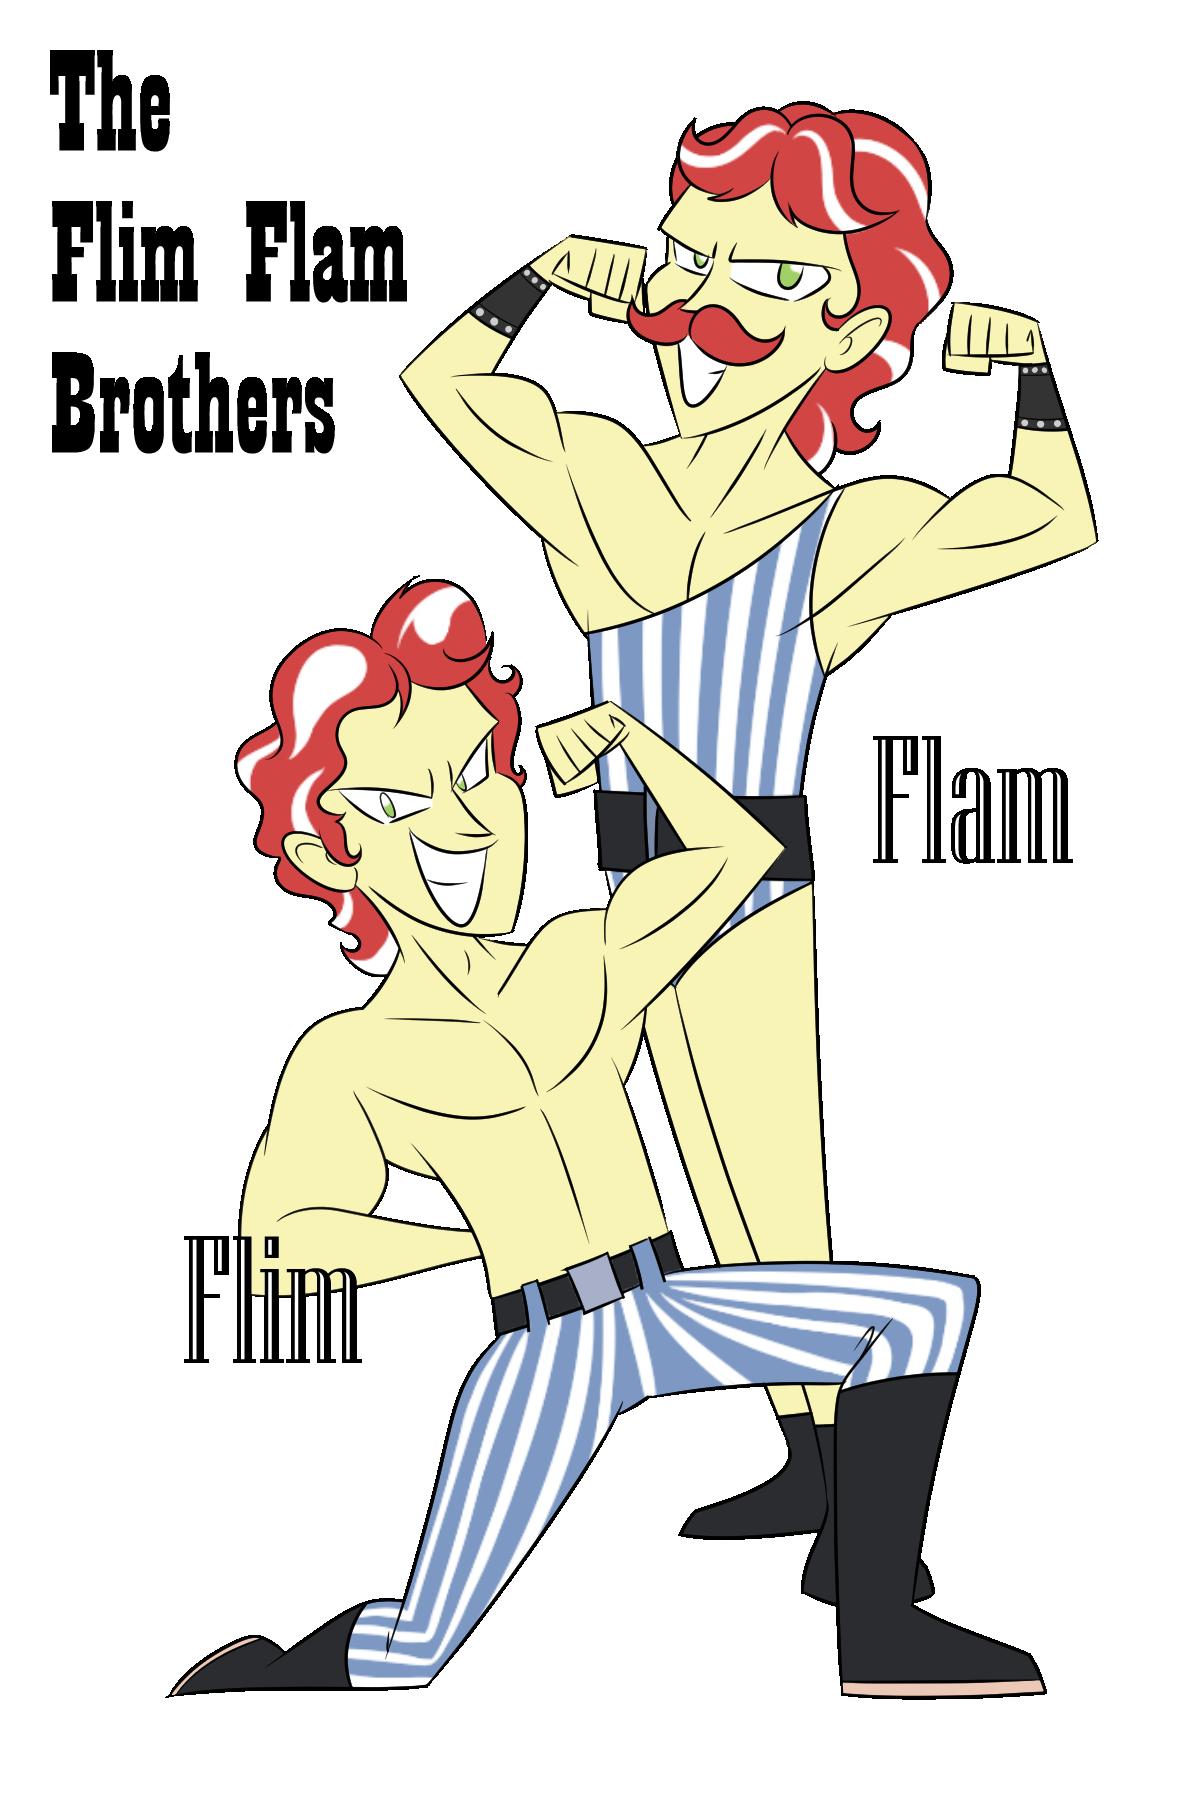 The Vaudevillainous Flim Flam Brothers